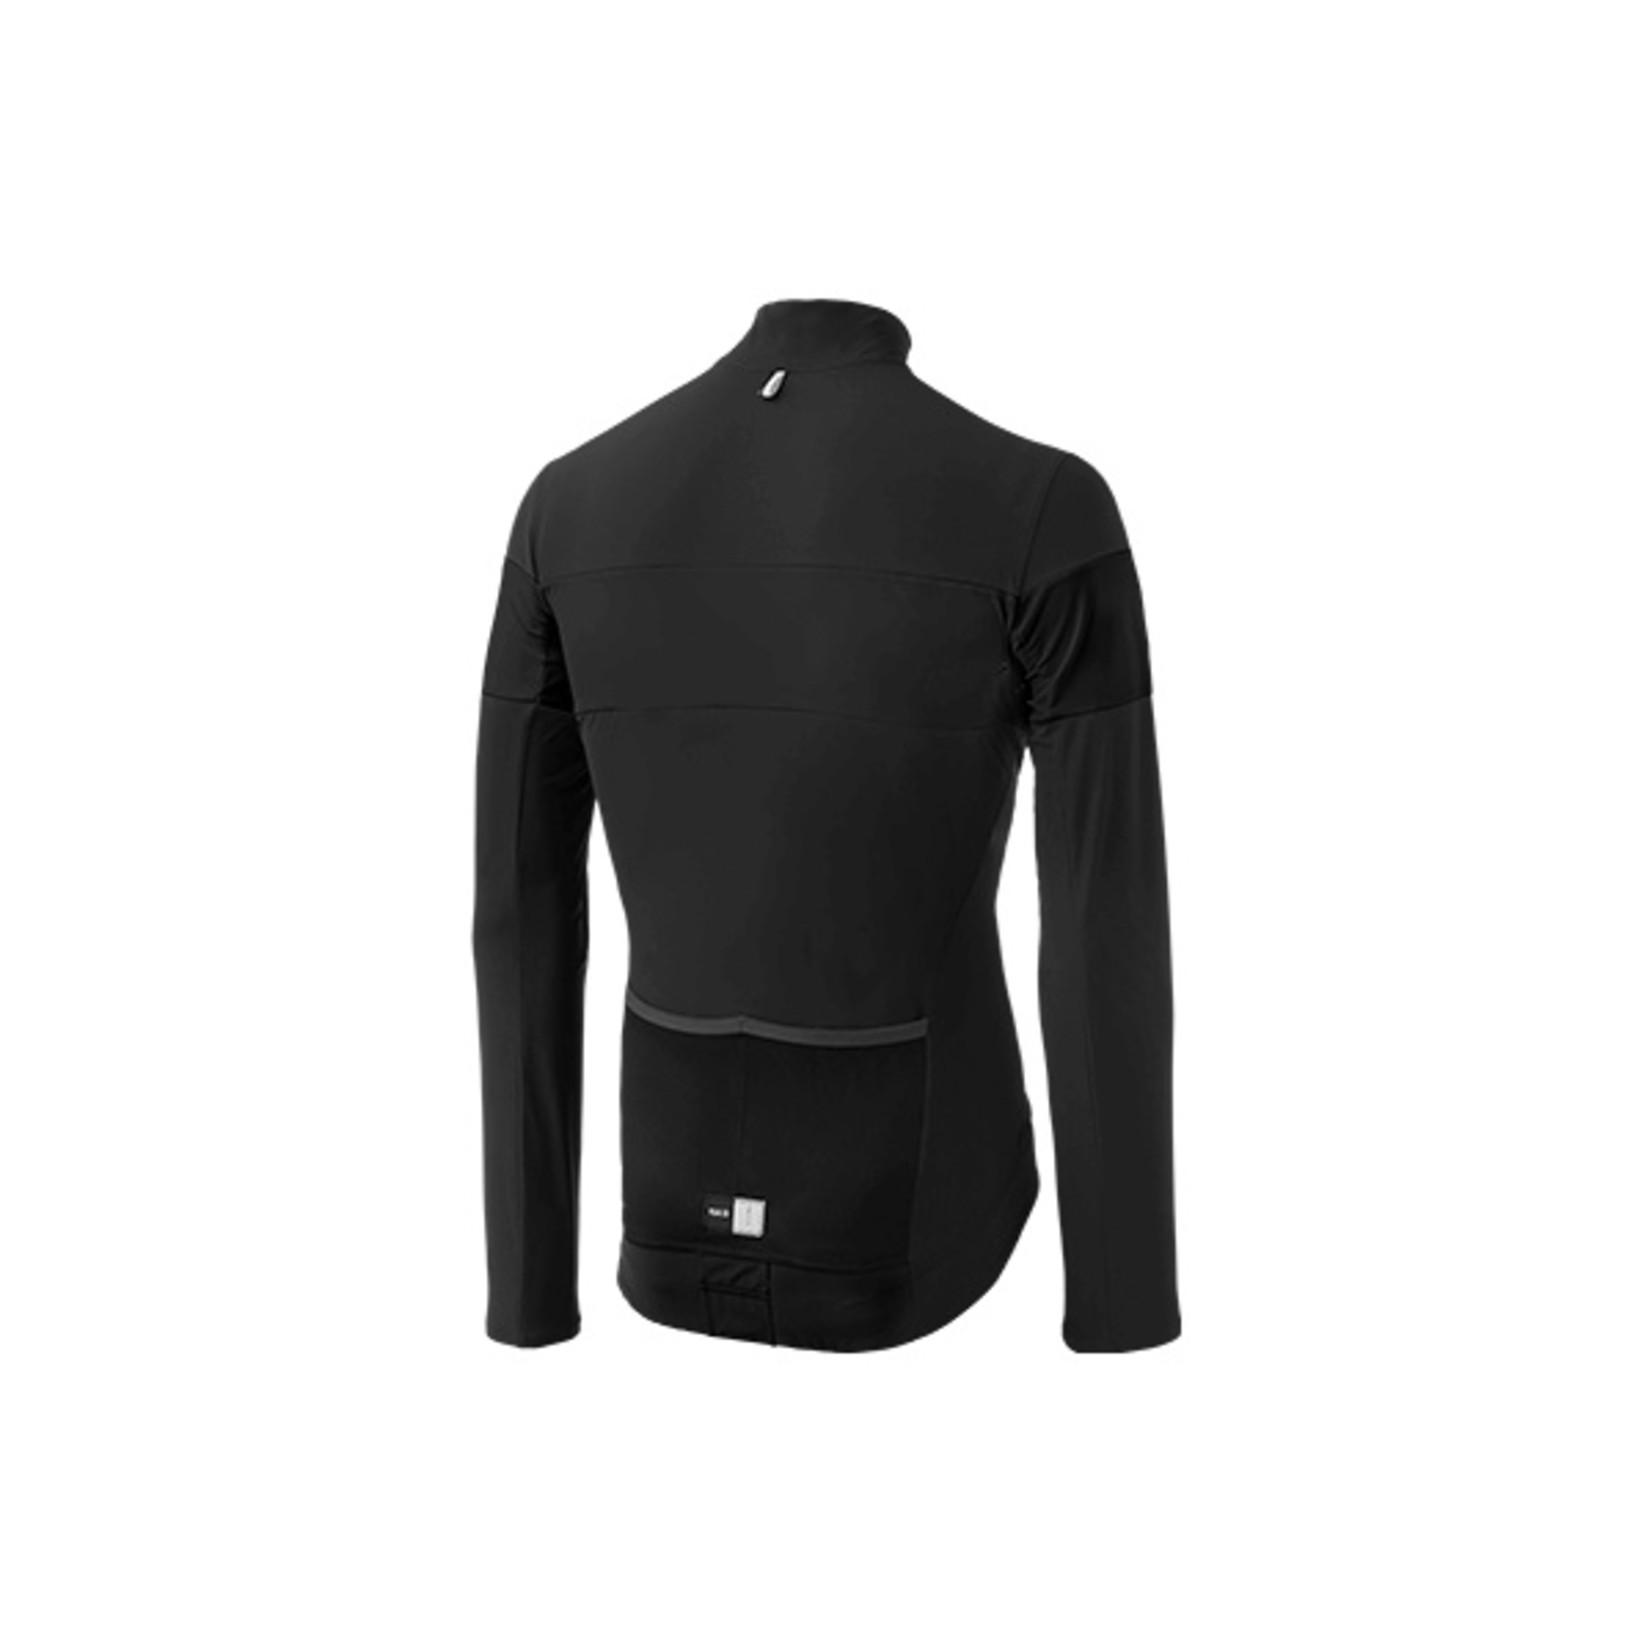 PEdALED PEdALED Nachi waterproof jacket M black